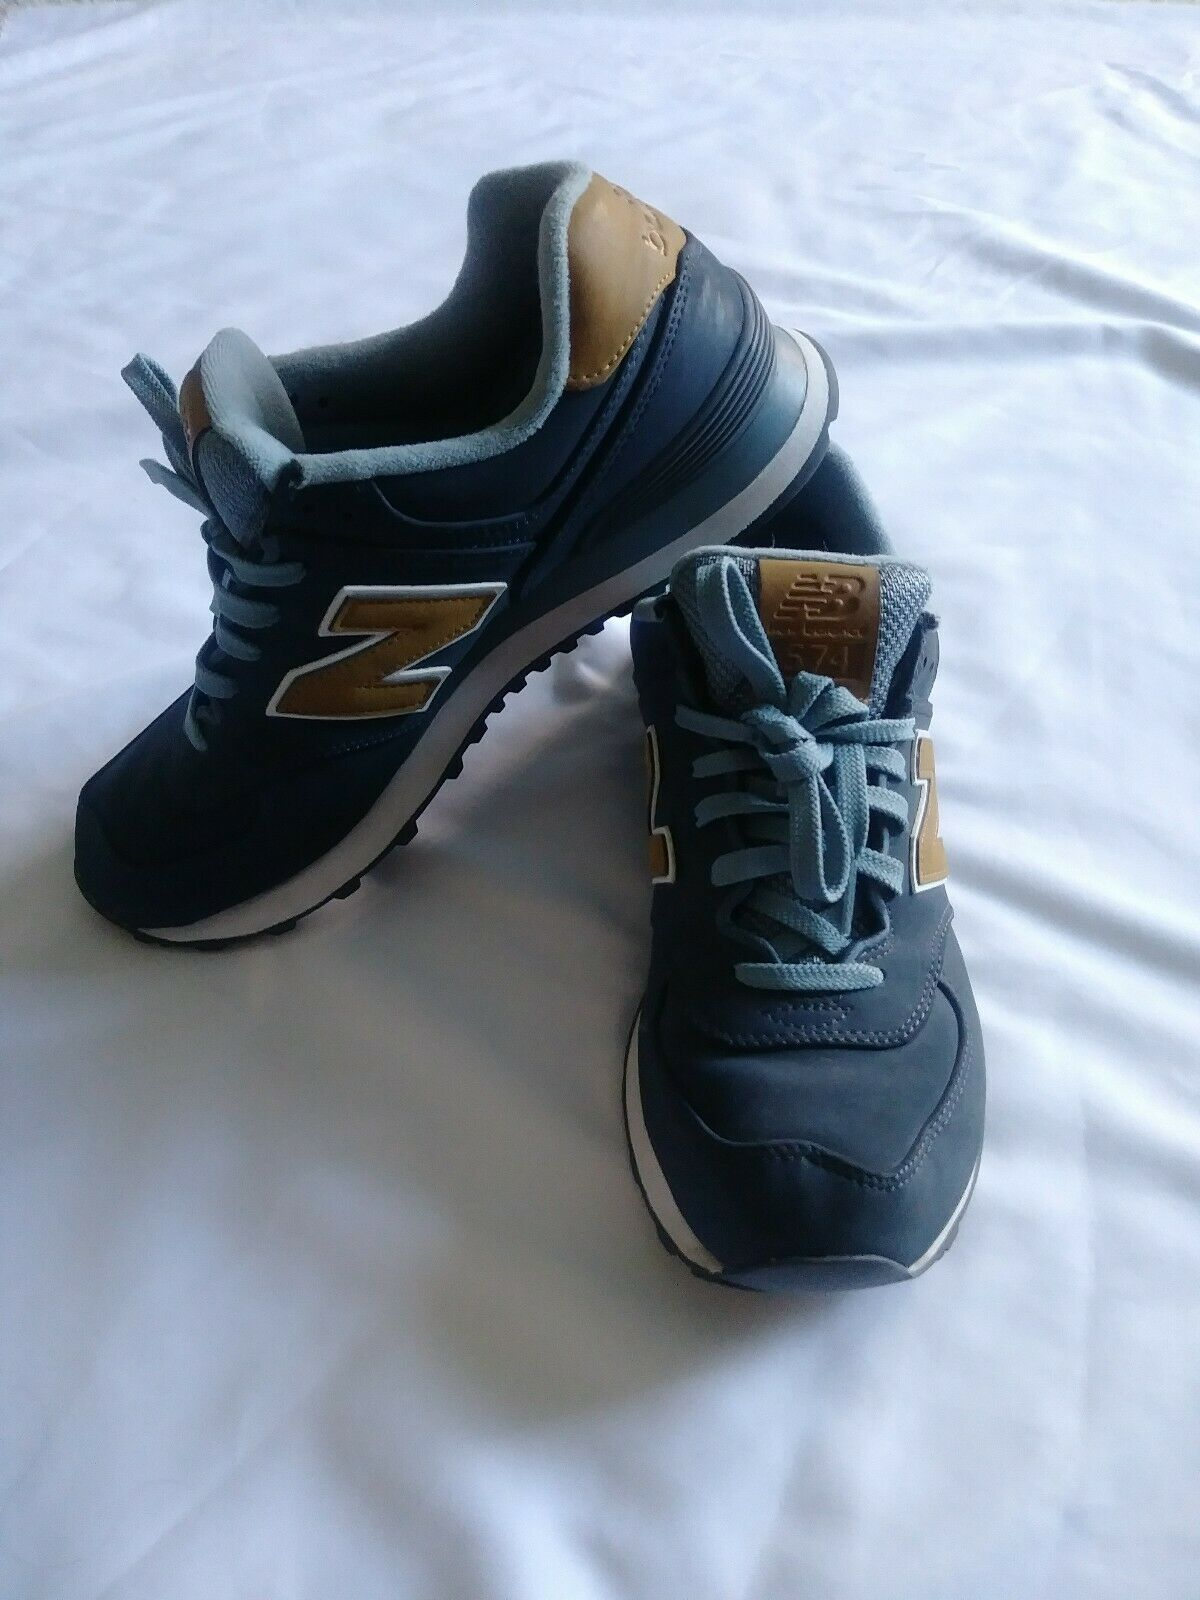 New balance tennis shoes mens 9